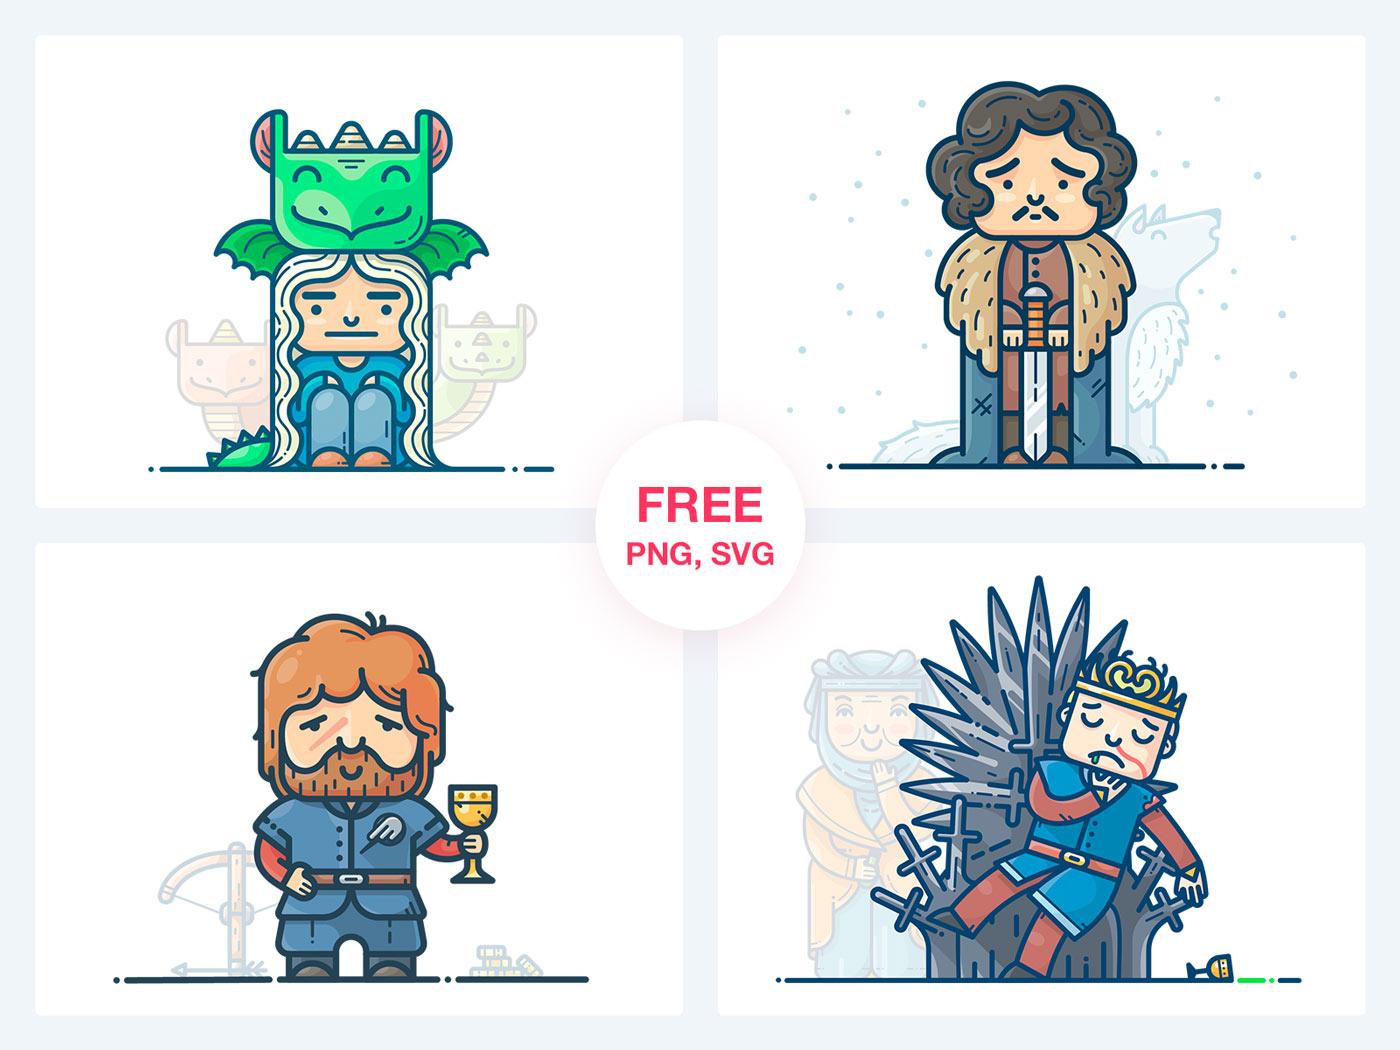 Game of Thrones 4 Characters Illustrations Игра Престолов svg png скачать бесплатно